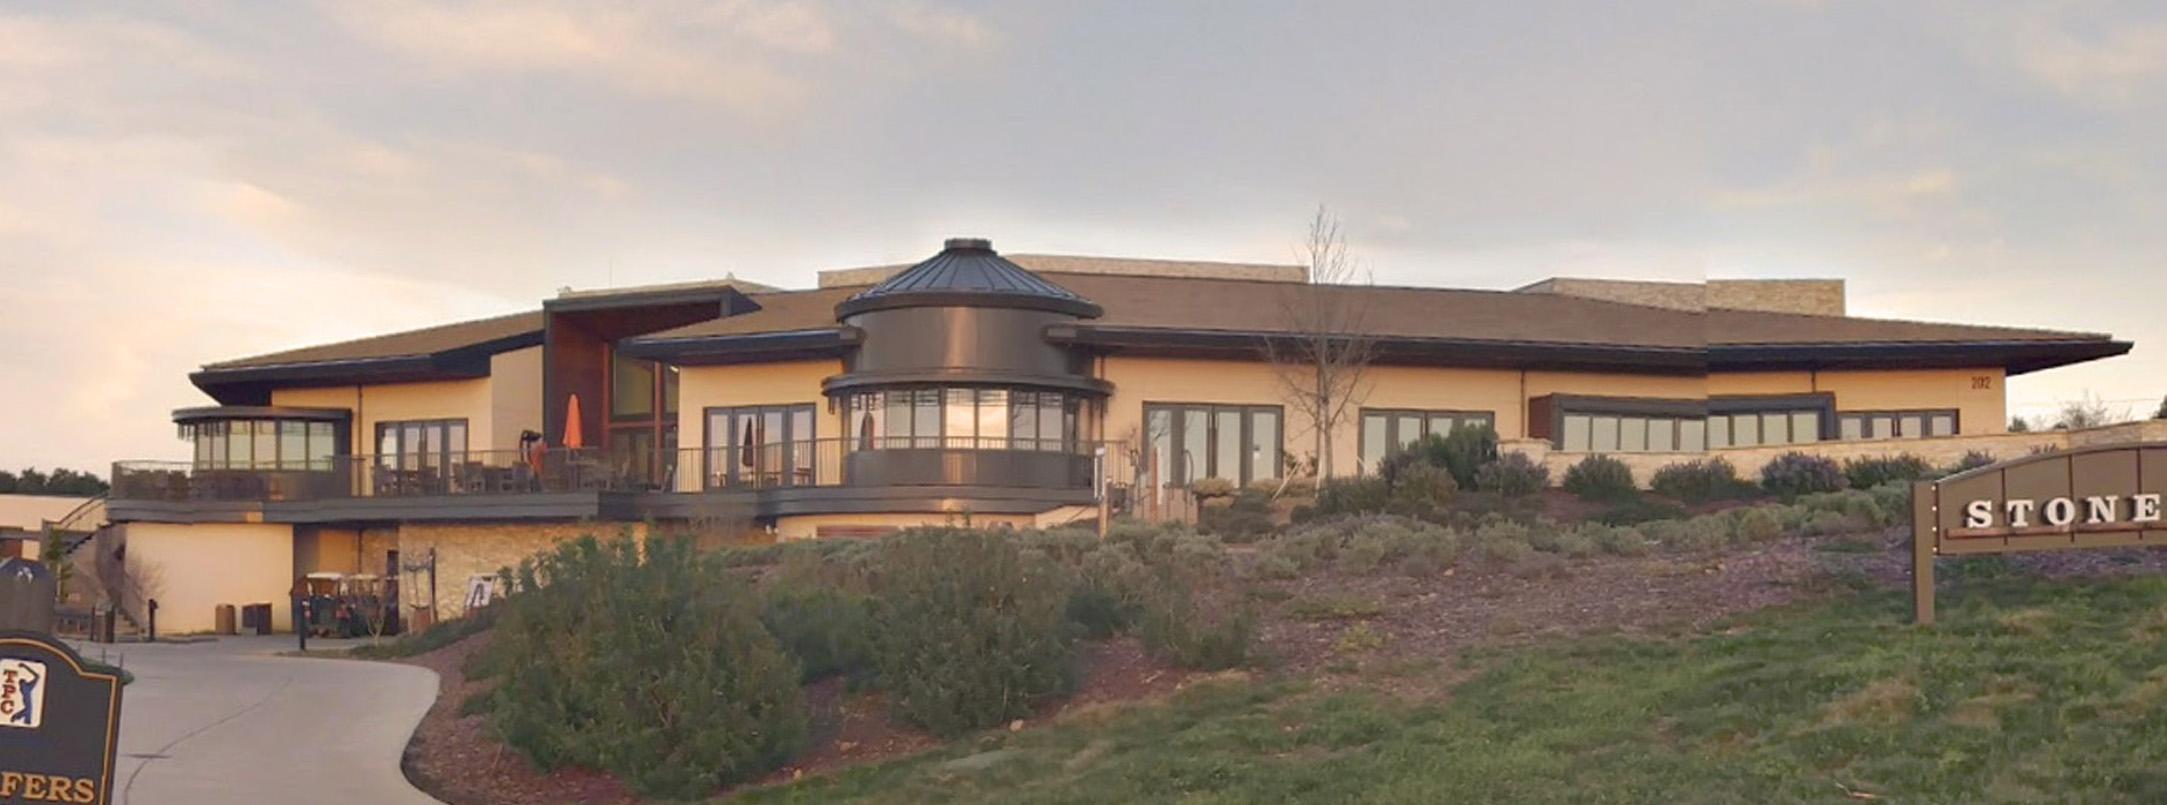 Stonebrae Country Club Renovation, Hayward